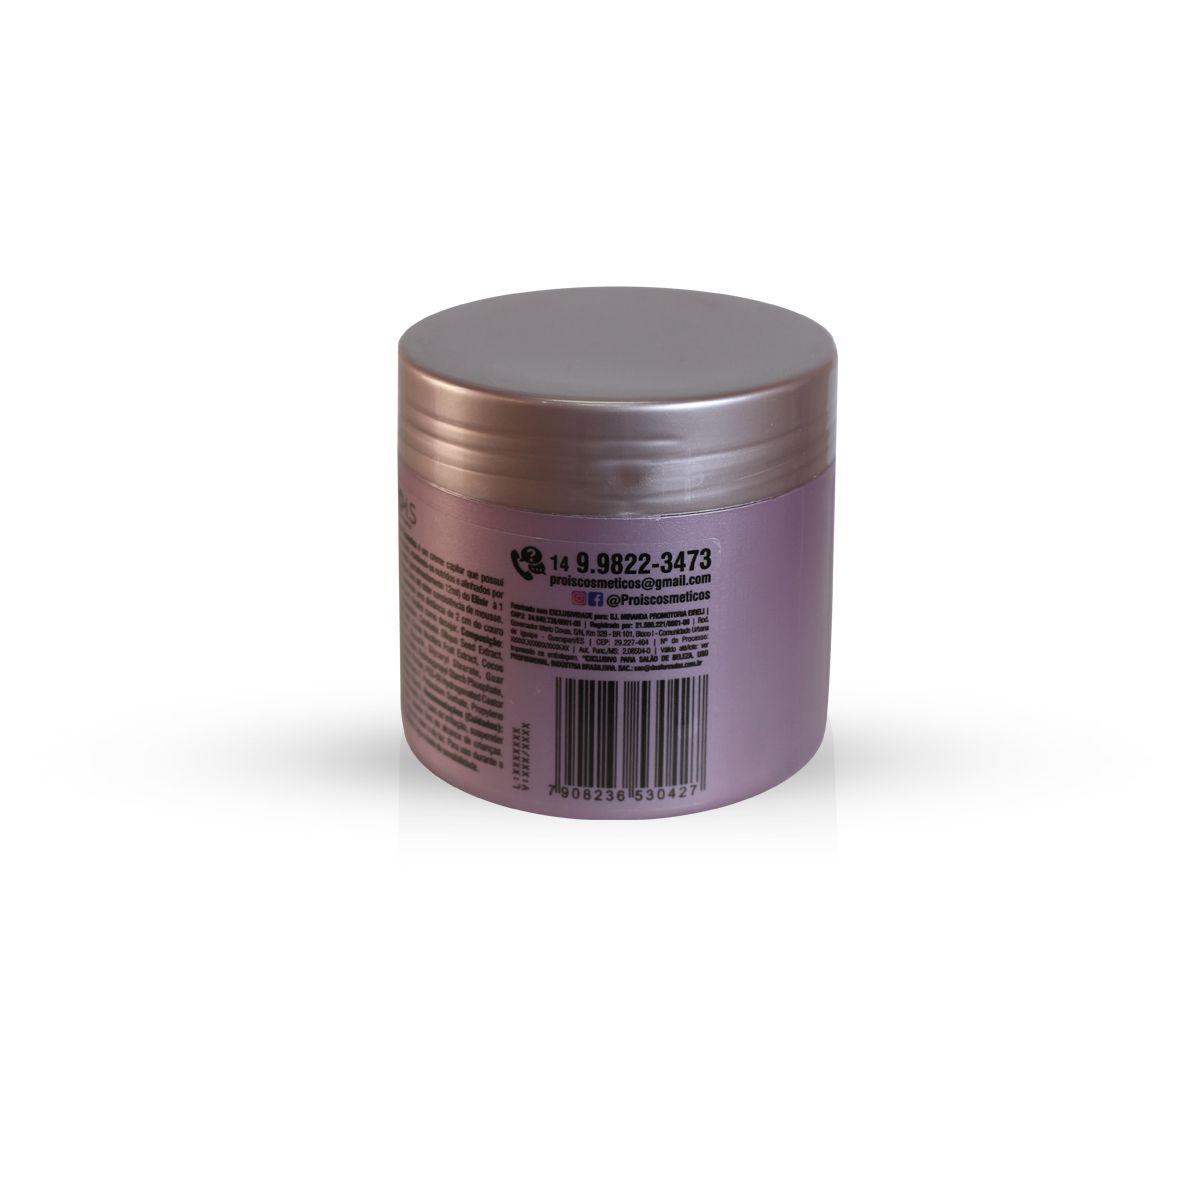 Oxitrix + Elixir Mousse de Hidratação Capilar Mix V-Pro Pro I.S